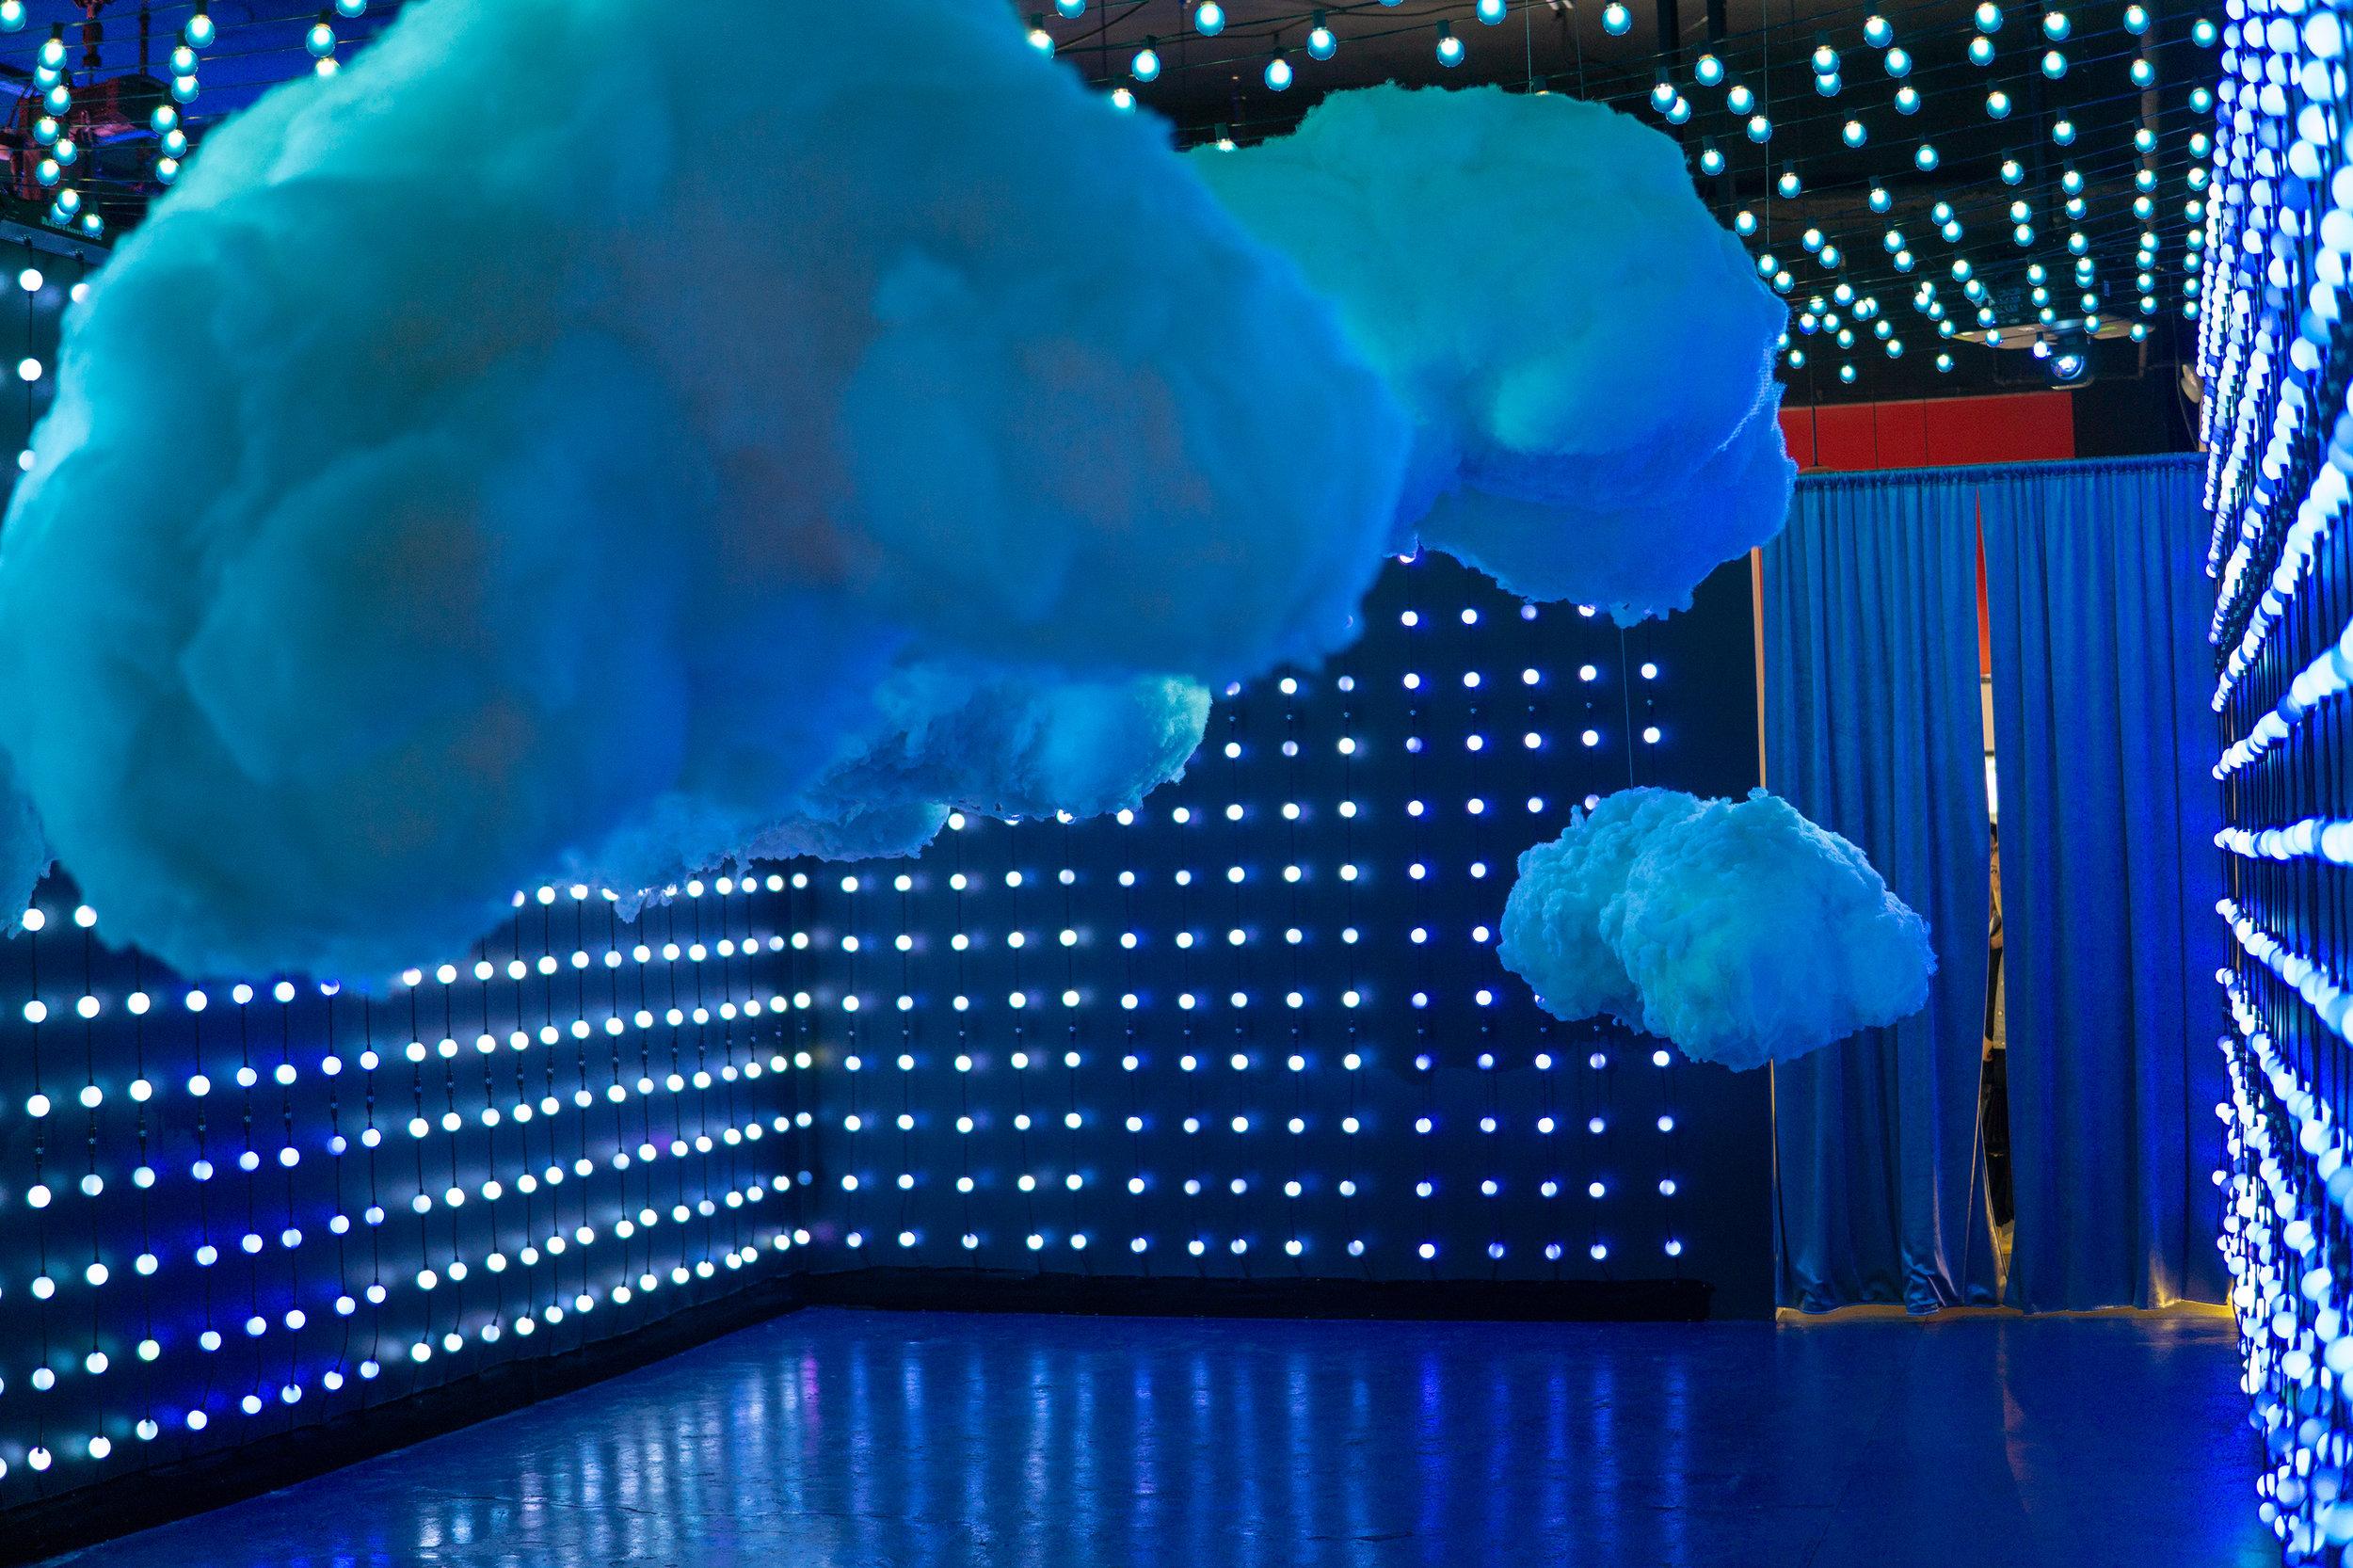 Walk Among The Clouds - Dream Machine